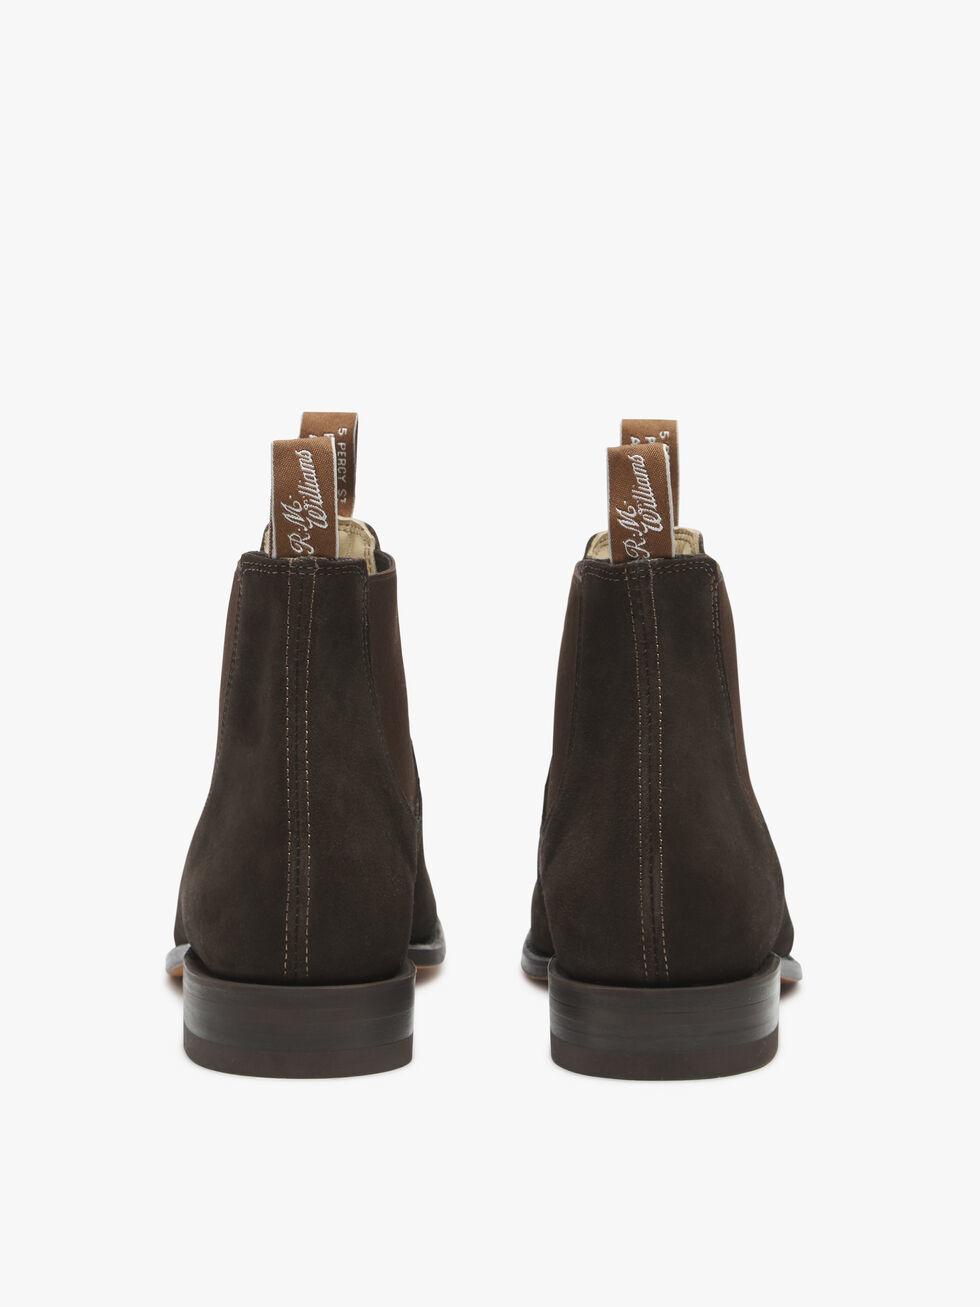 RM Williams Suede Comfort Craftsman